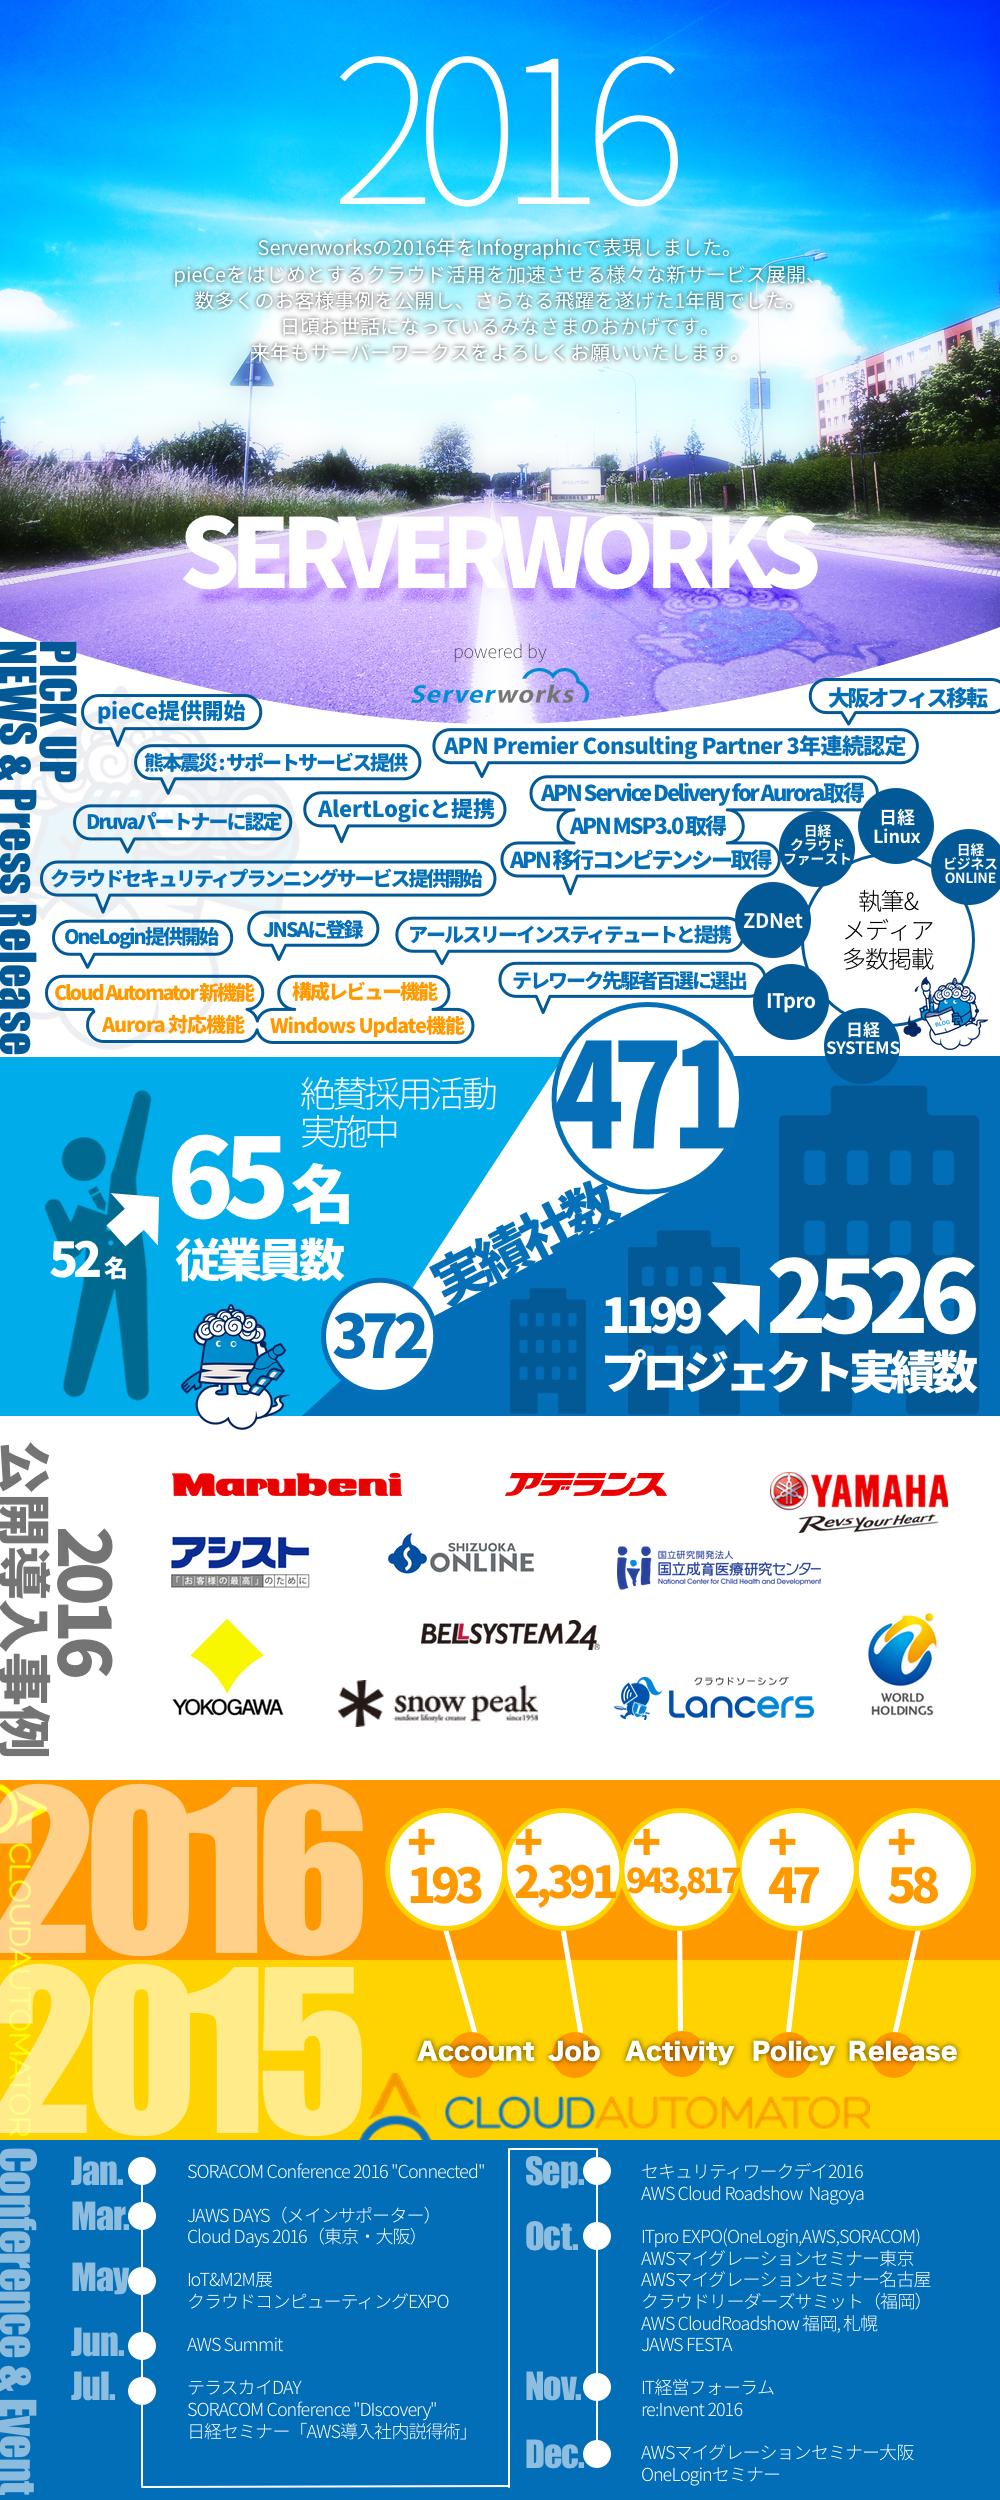 Serverworks_infographic2016.png